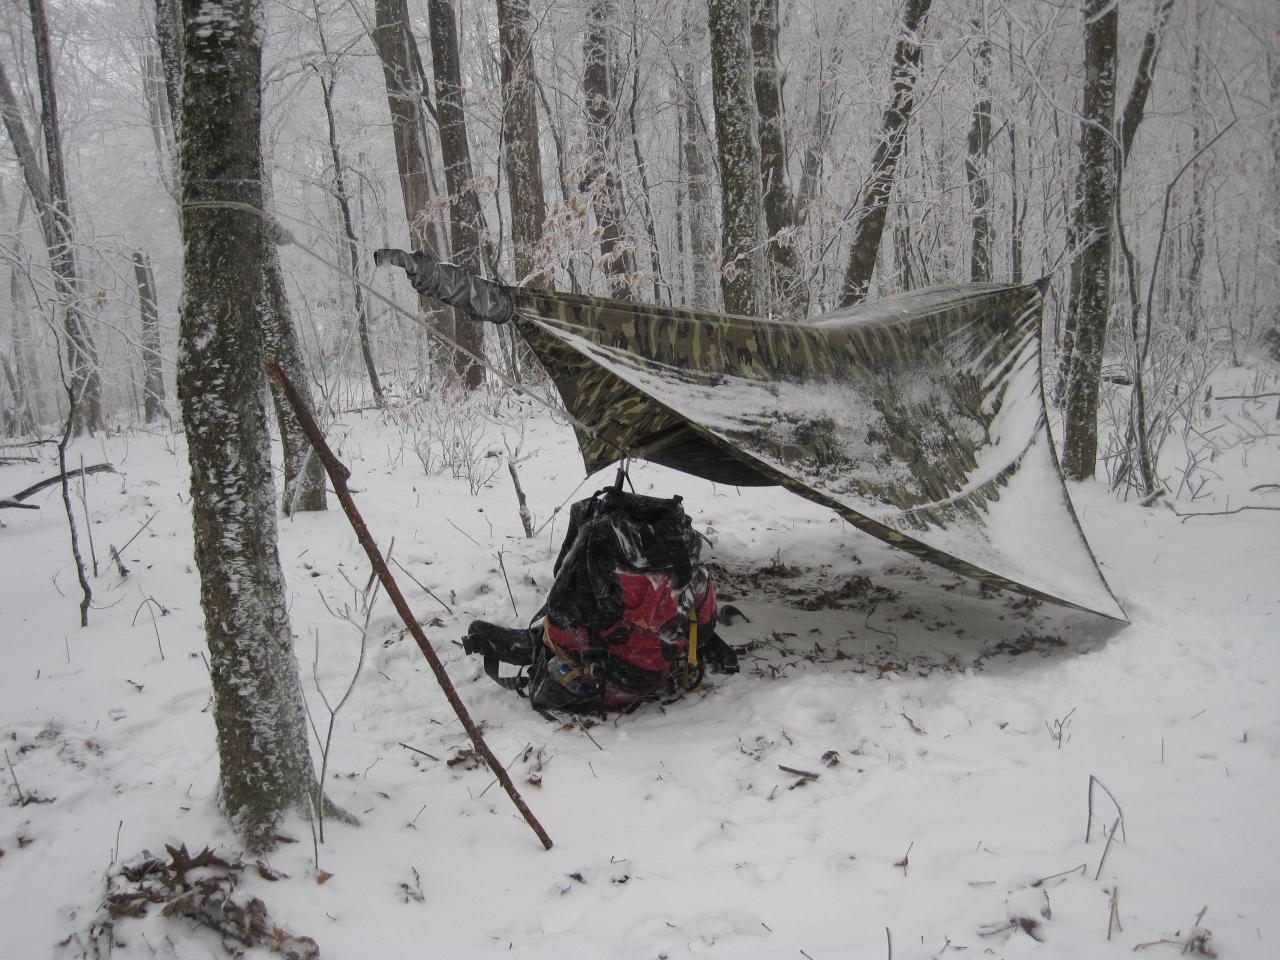 A.t. Cold Snow Hammock